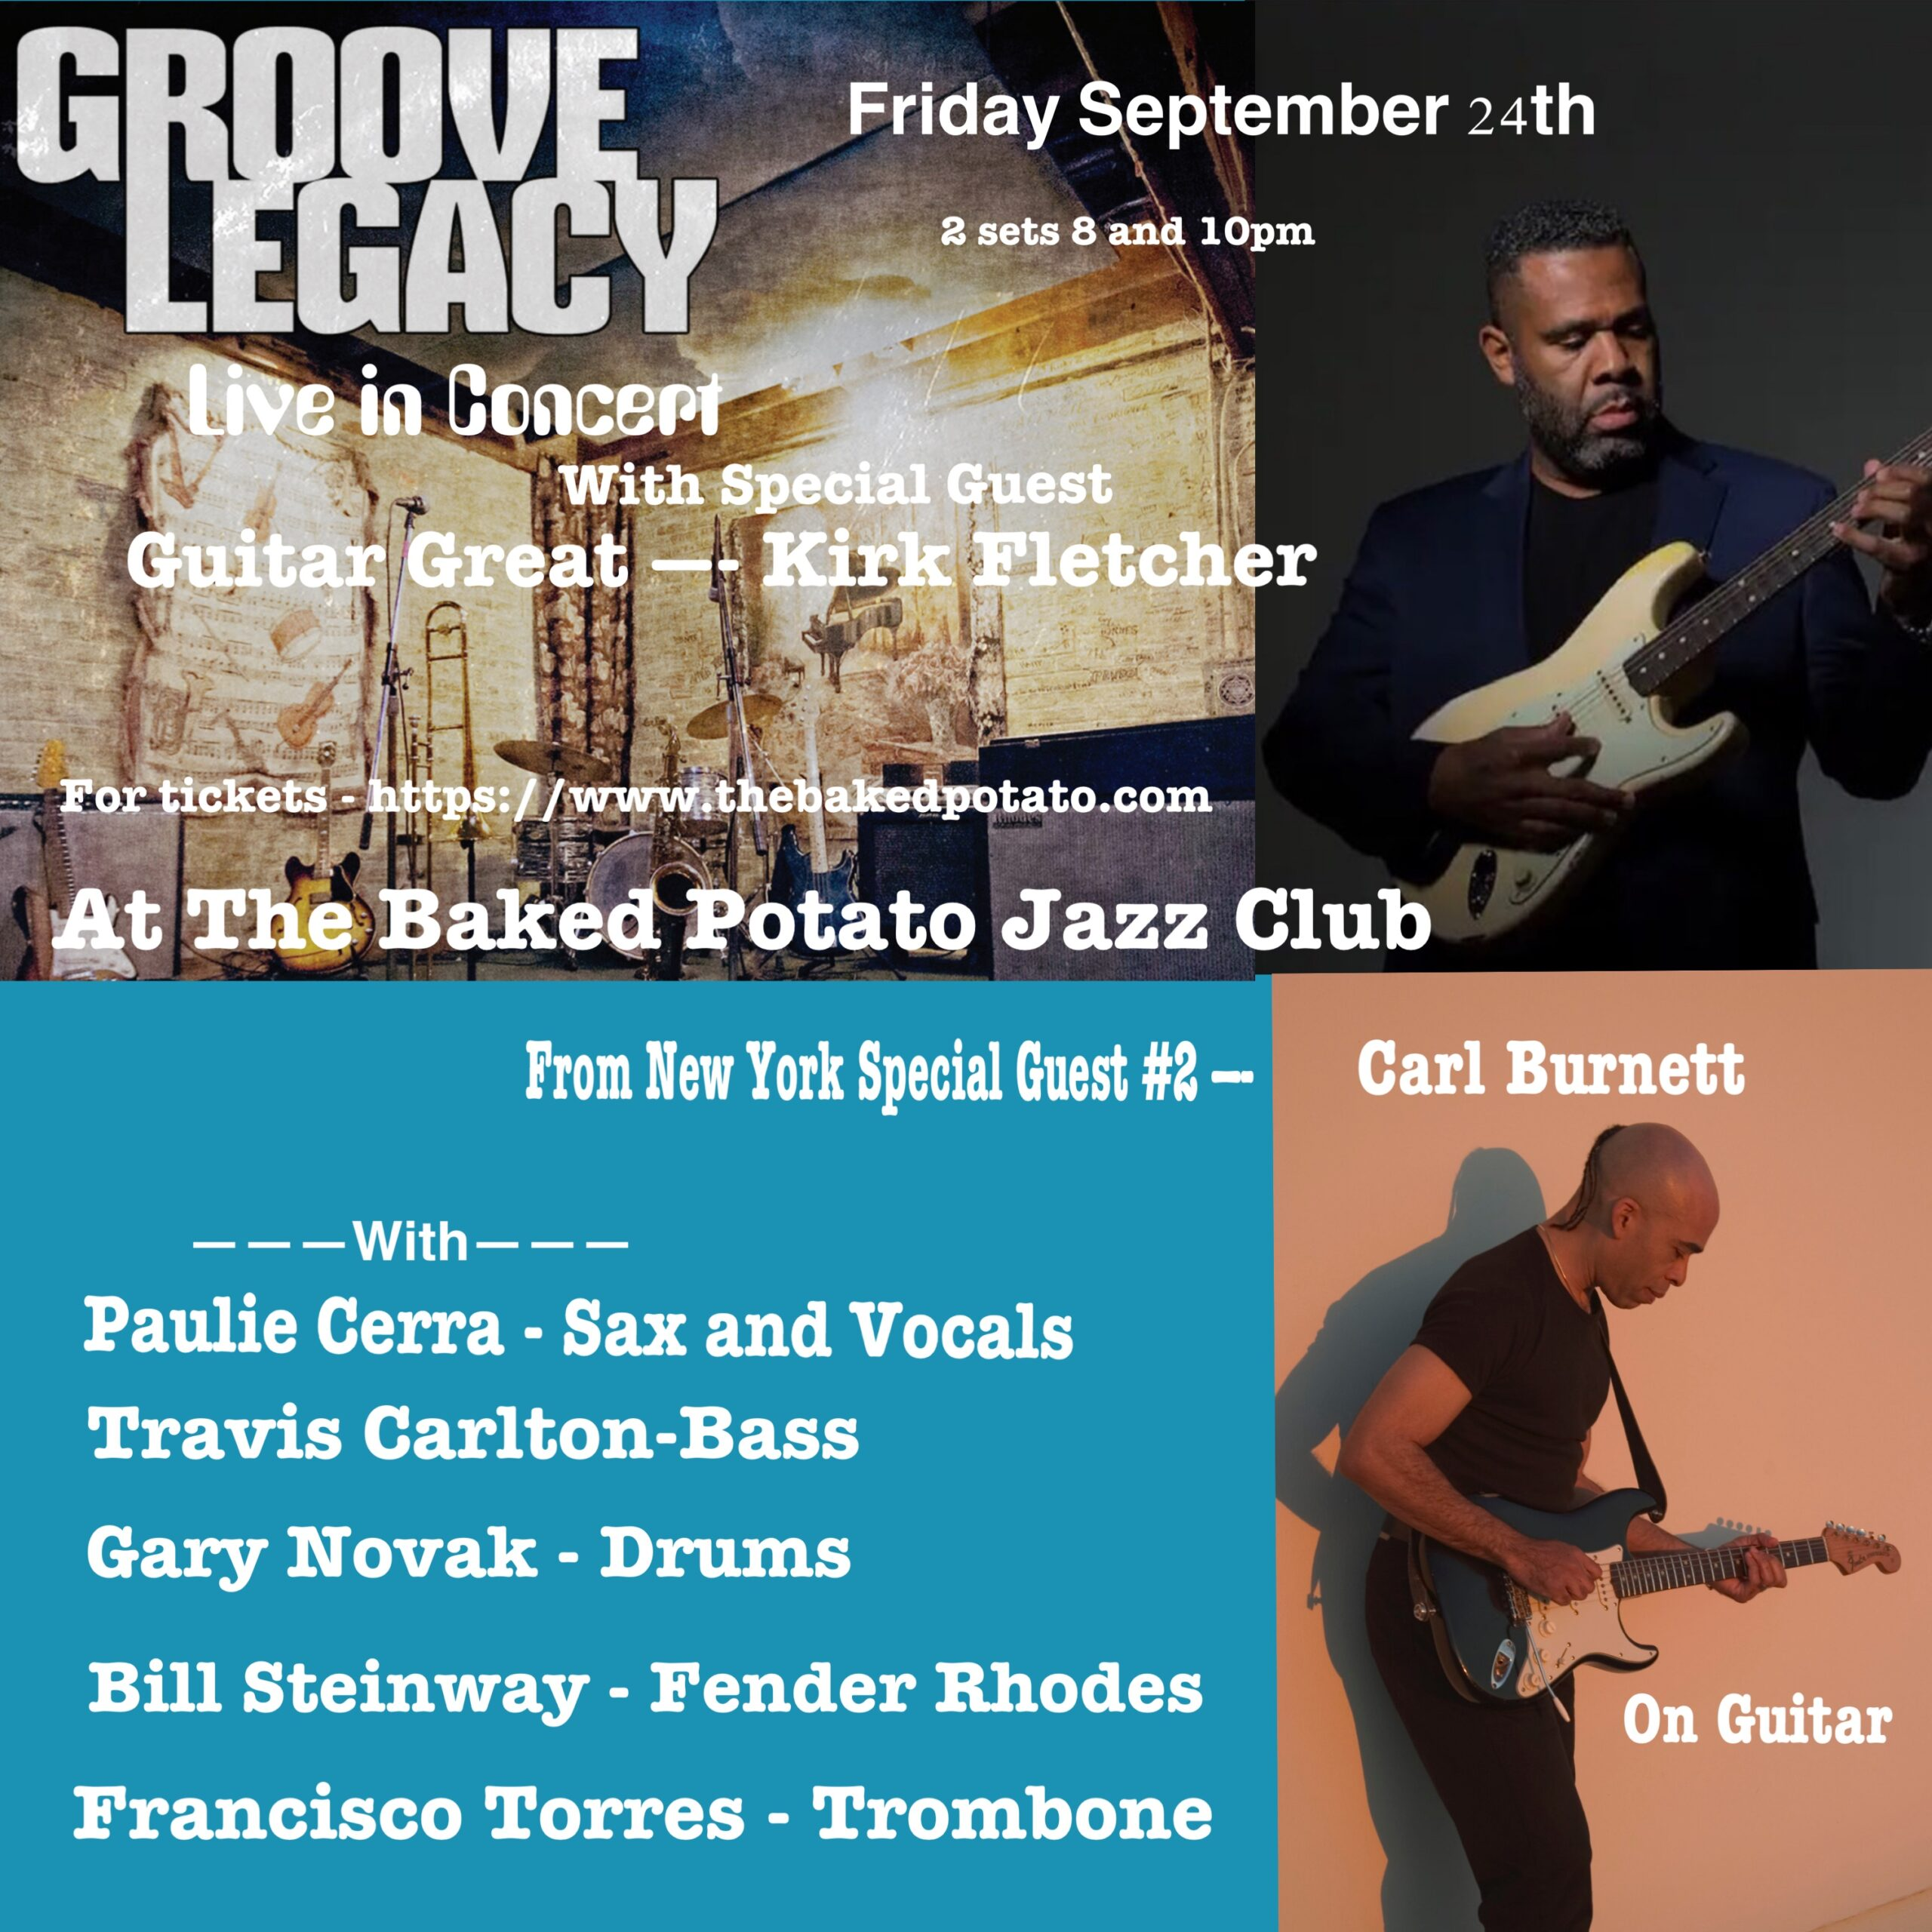 GROOVE LEGACY - Friday, September 24, 2021